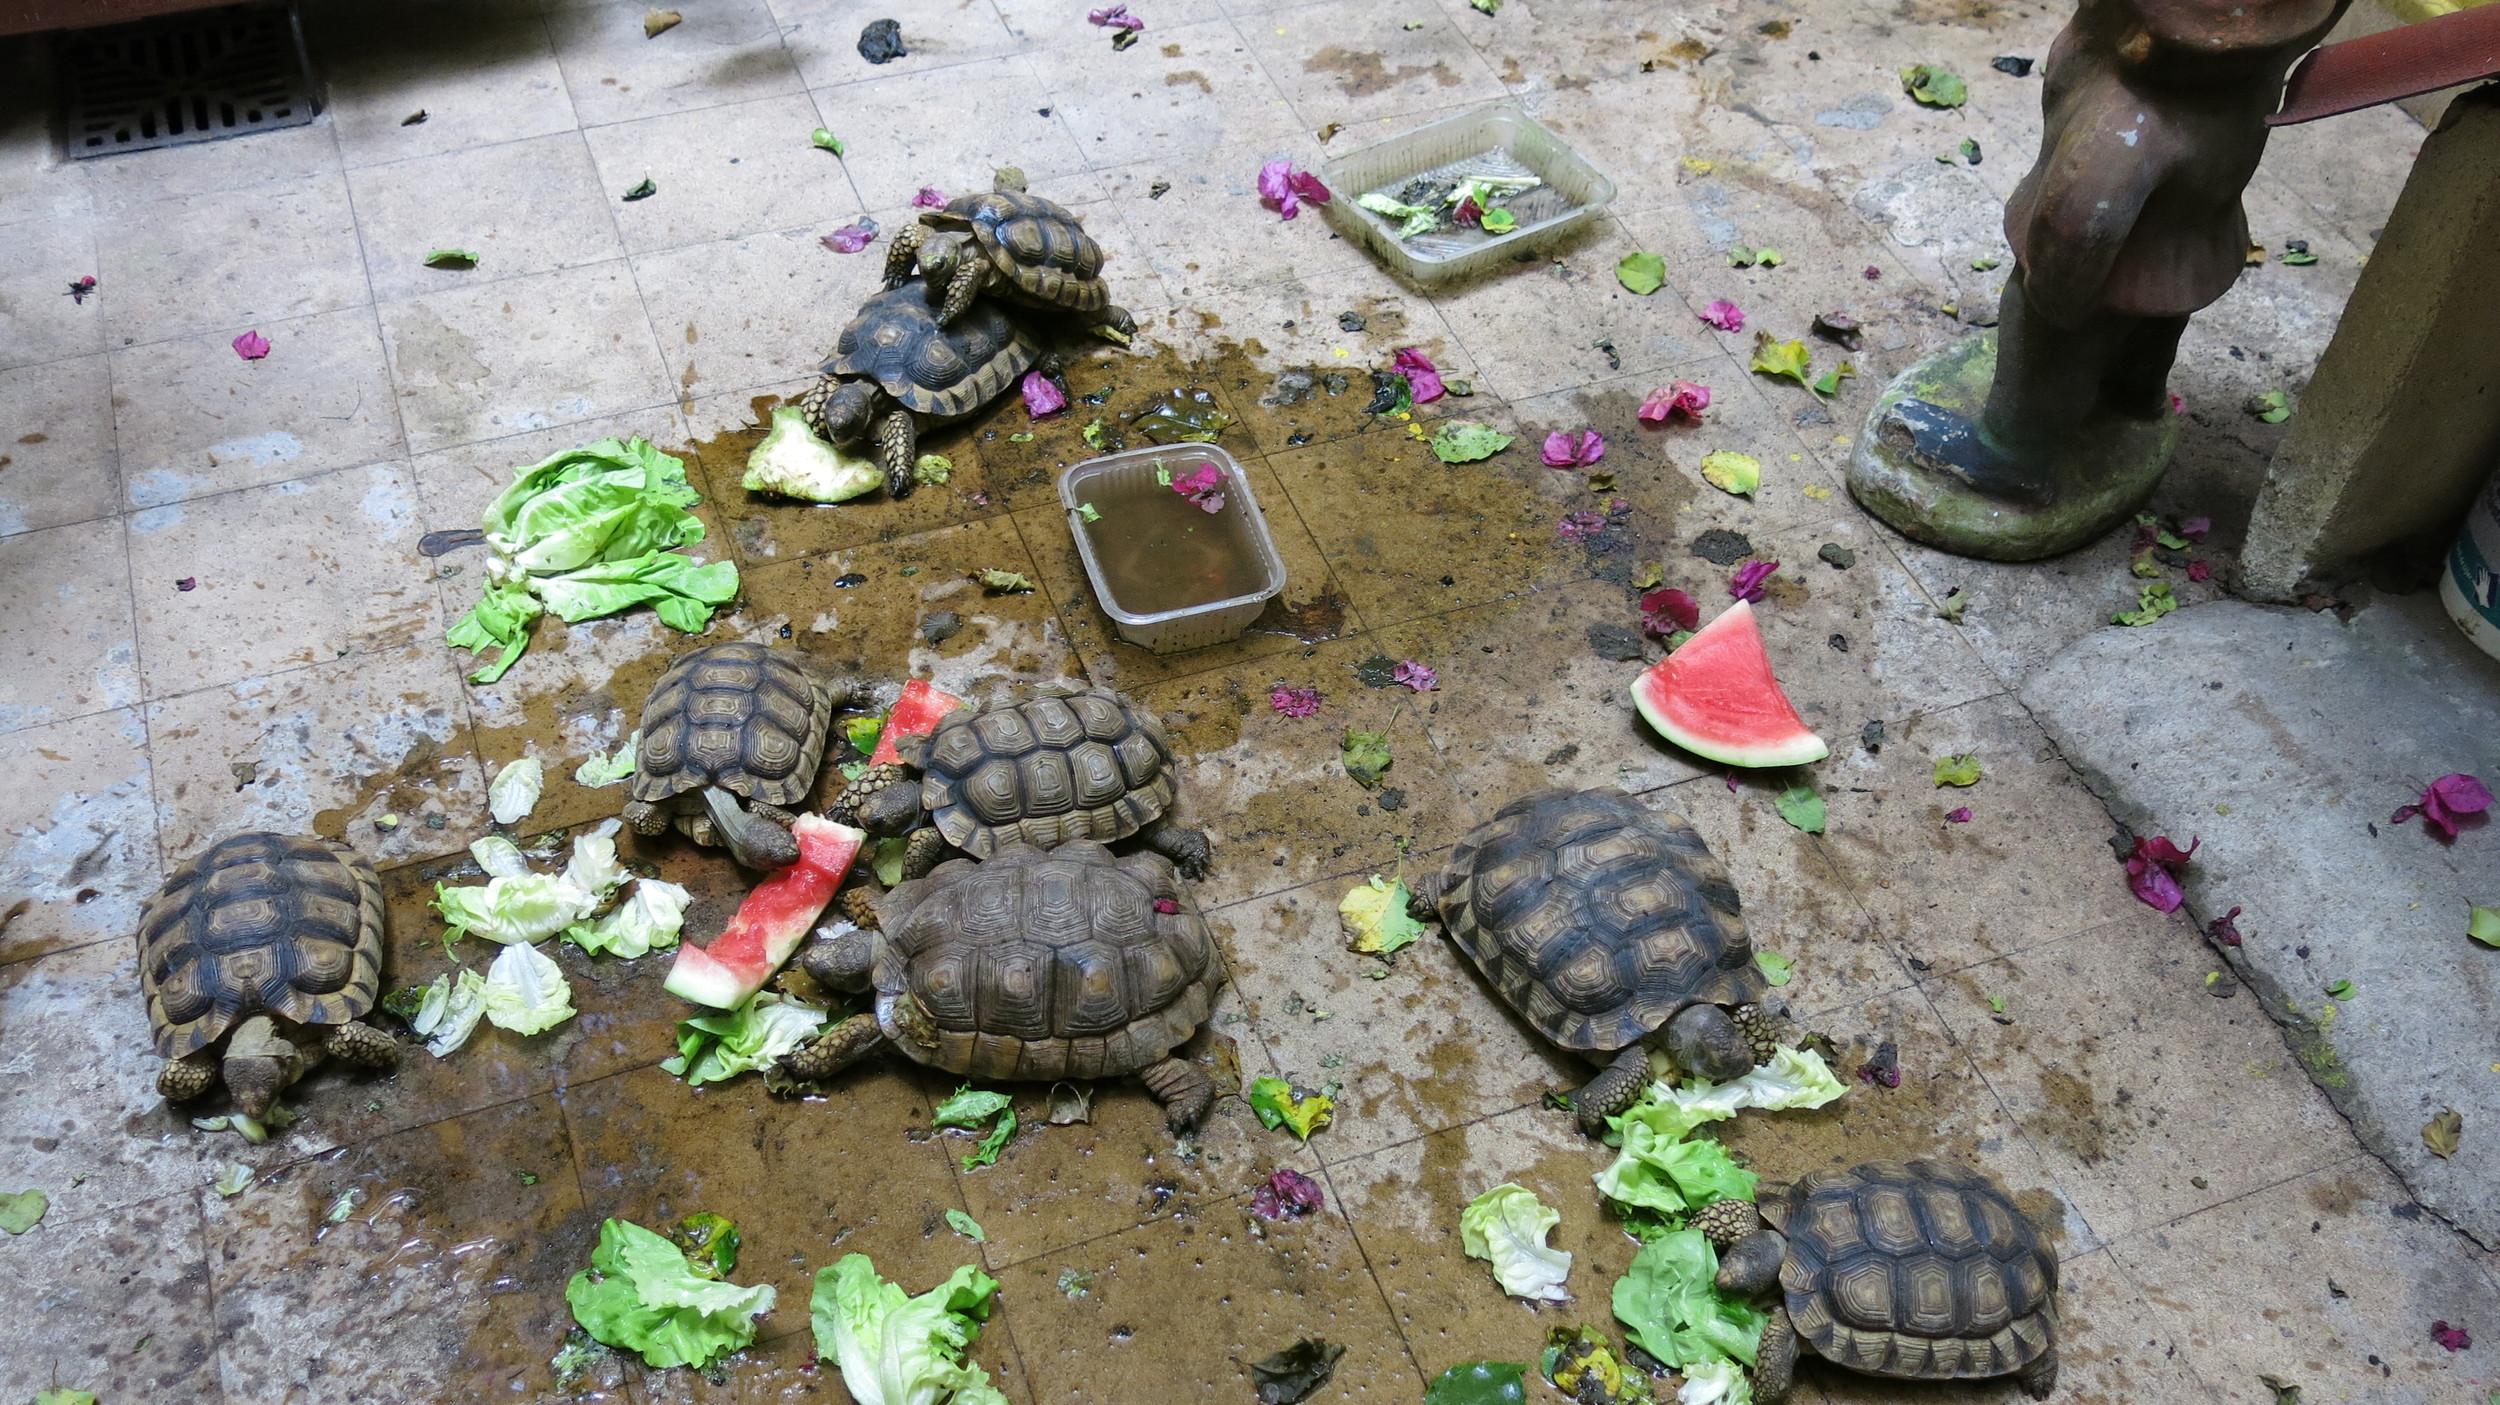 Turtles caught on iPhone at Mirta's Studio.